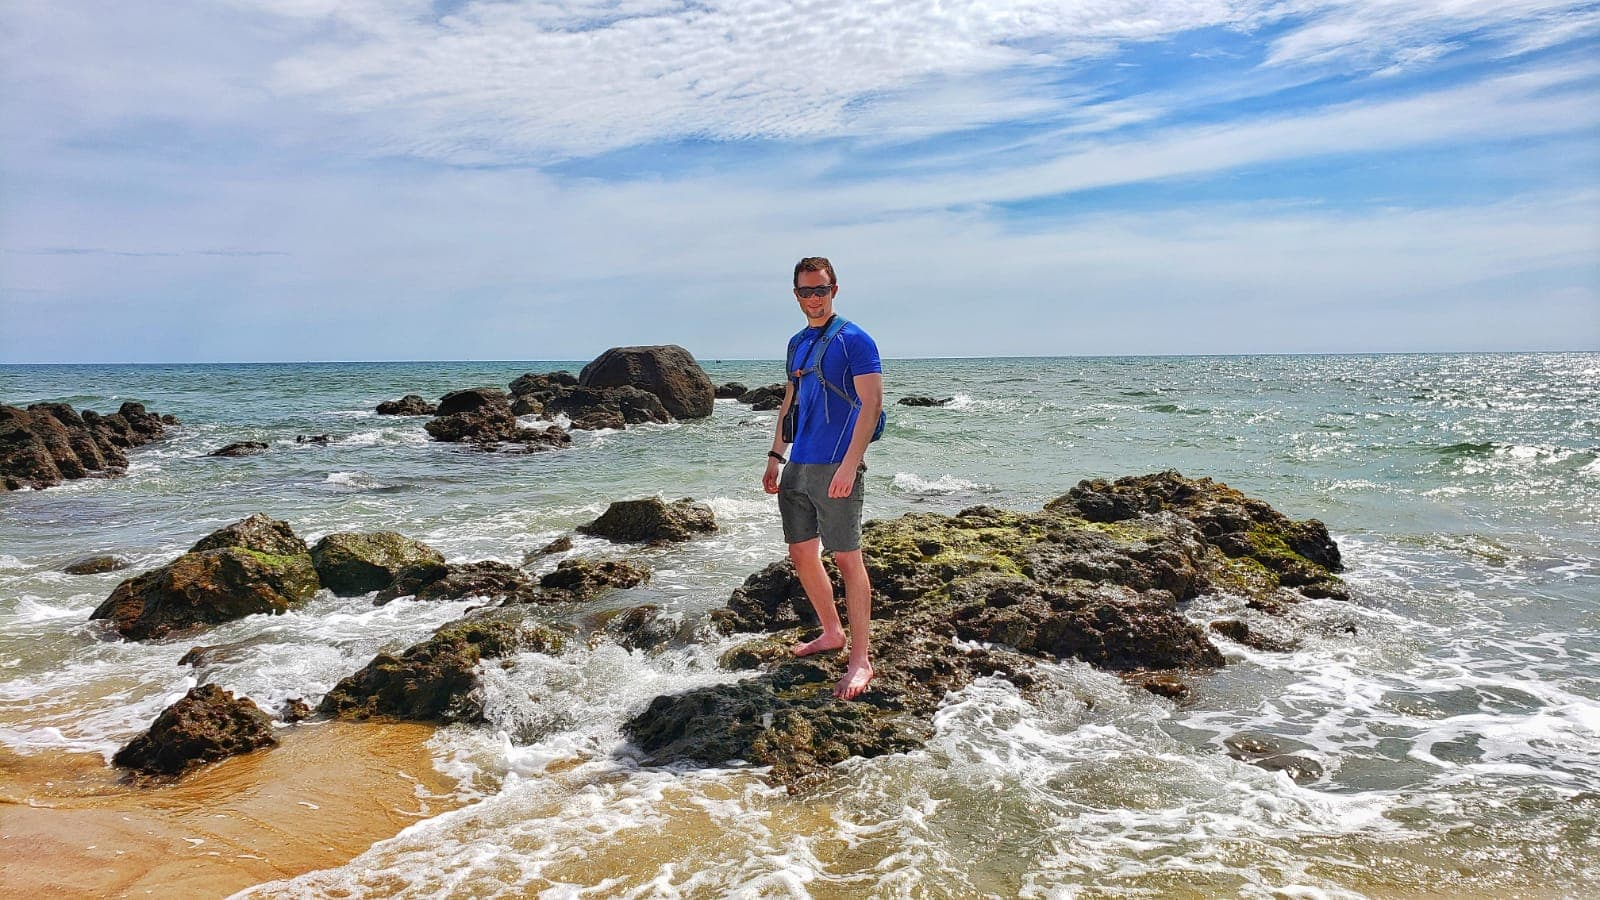 Hue-beaches-Top-5-most-beautiful-beaches-in-Hue-Culture-Pham-Travel